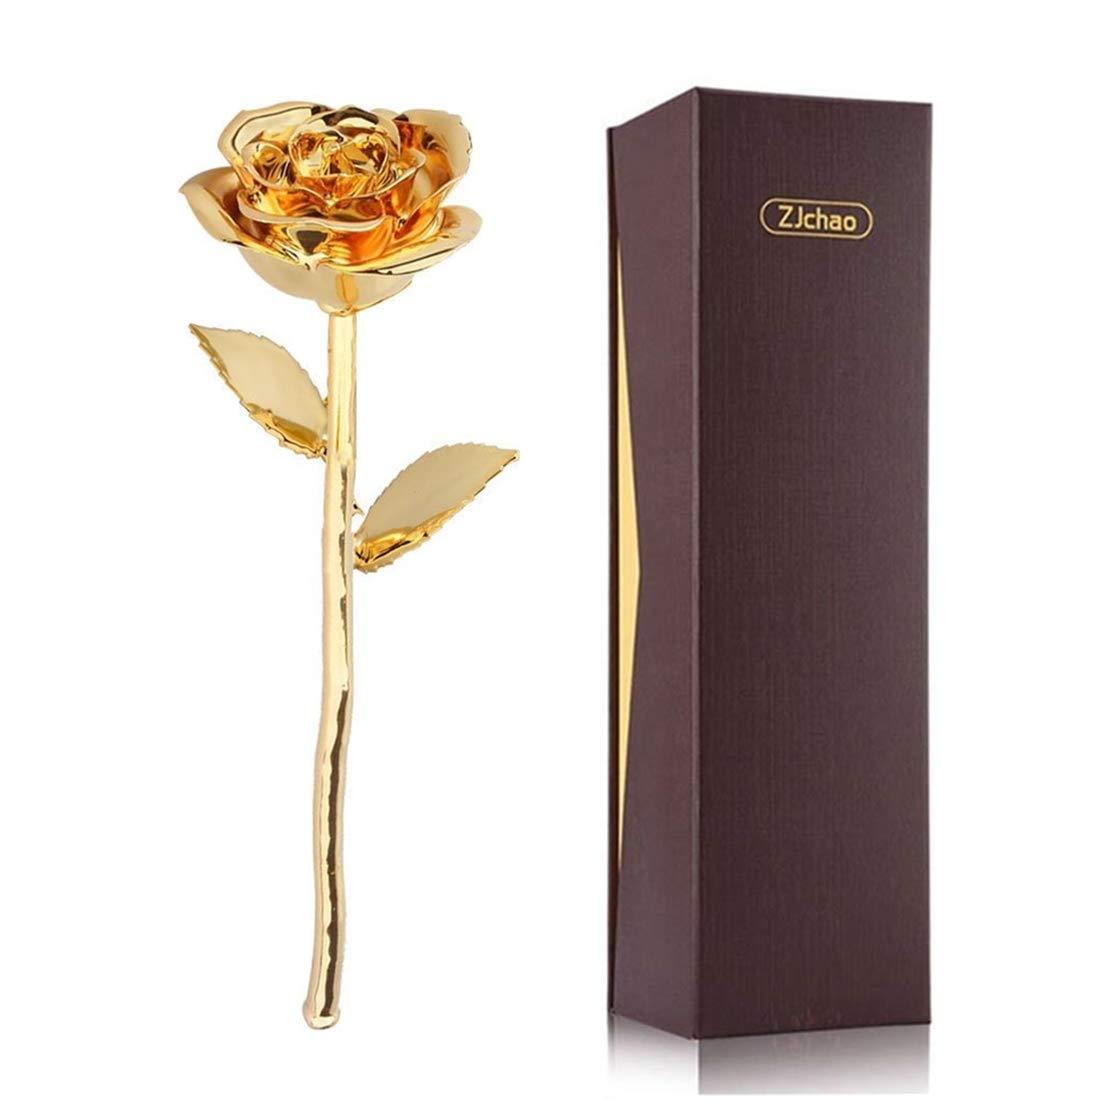 ZJchao 24K Gold Rose Gift for Her Mother's Day Anniversary Romantic Eternity Love Real Golden Plated Preserved Forever Rose Flower, Best Present for Wife/Mom/Grandma/Women (Gold)